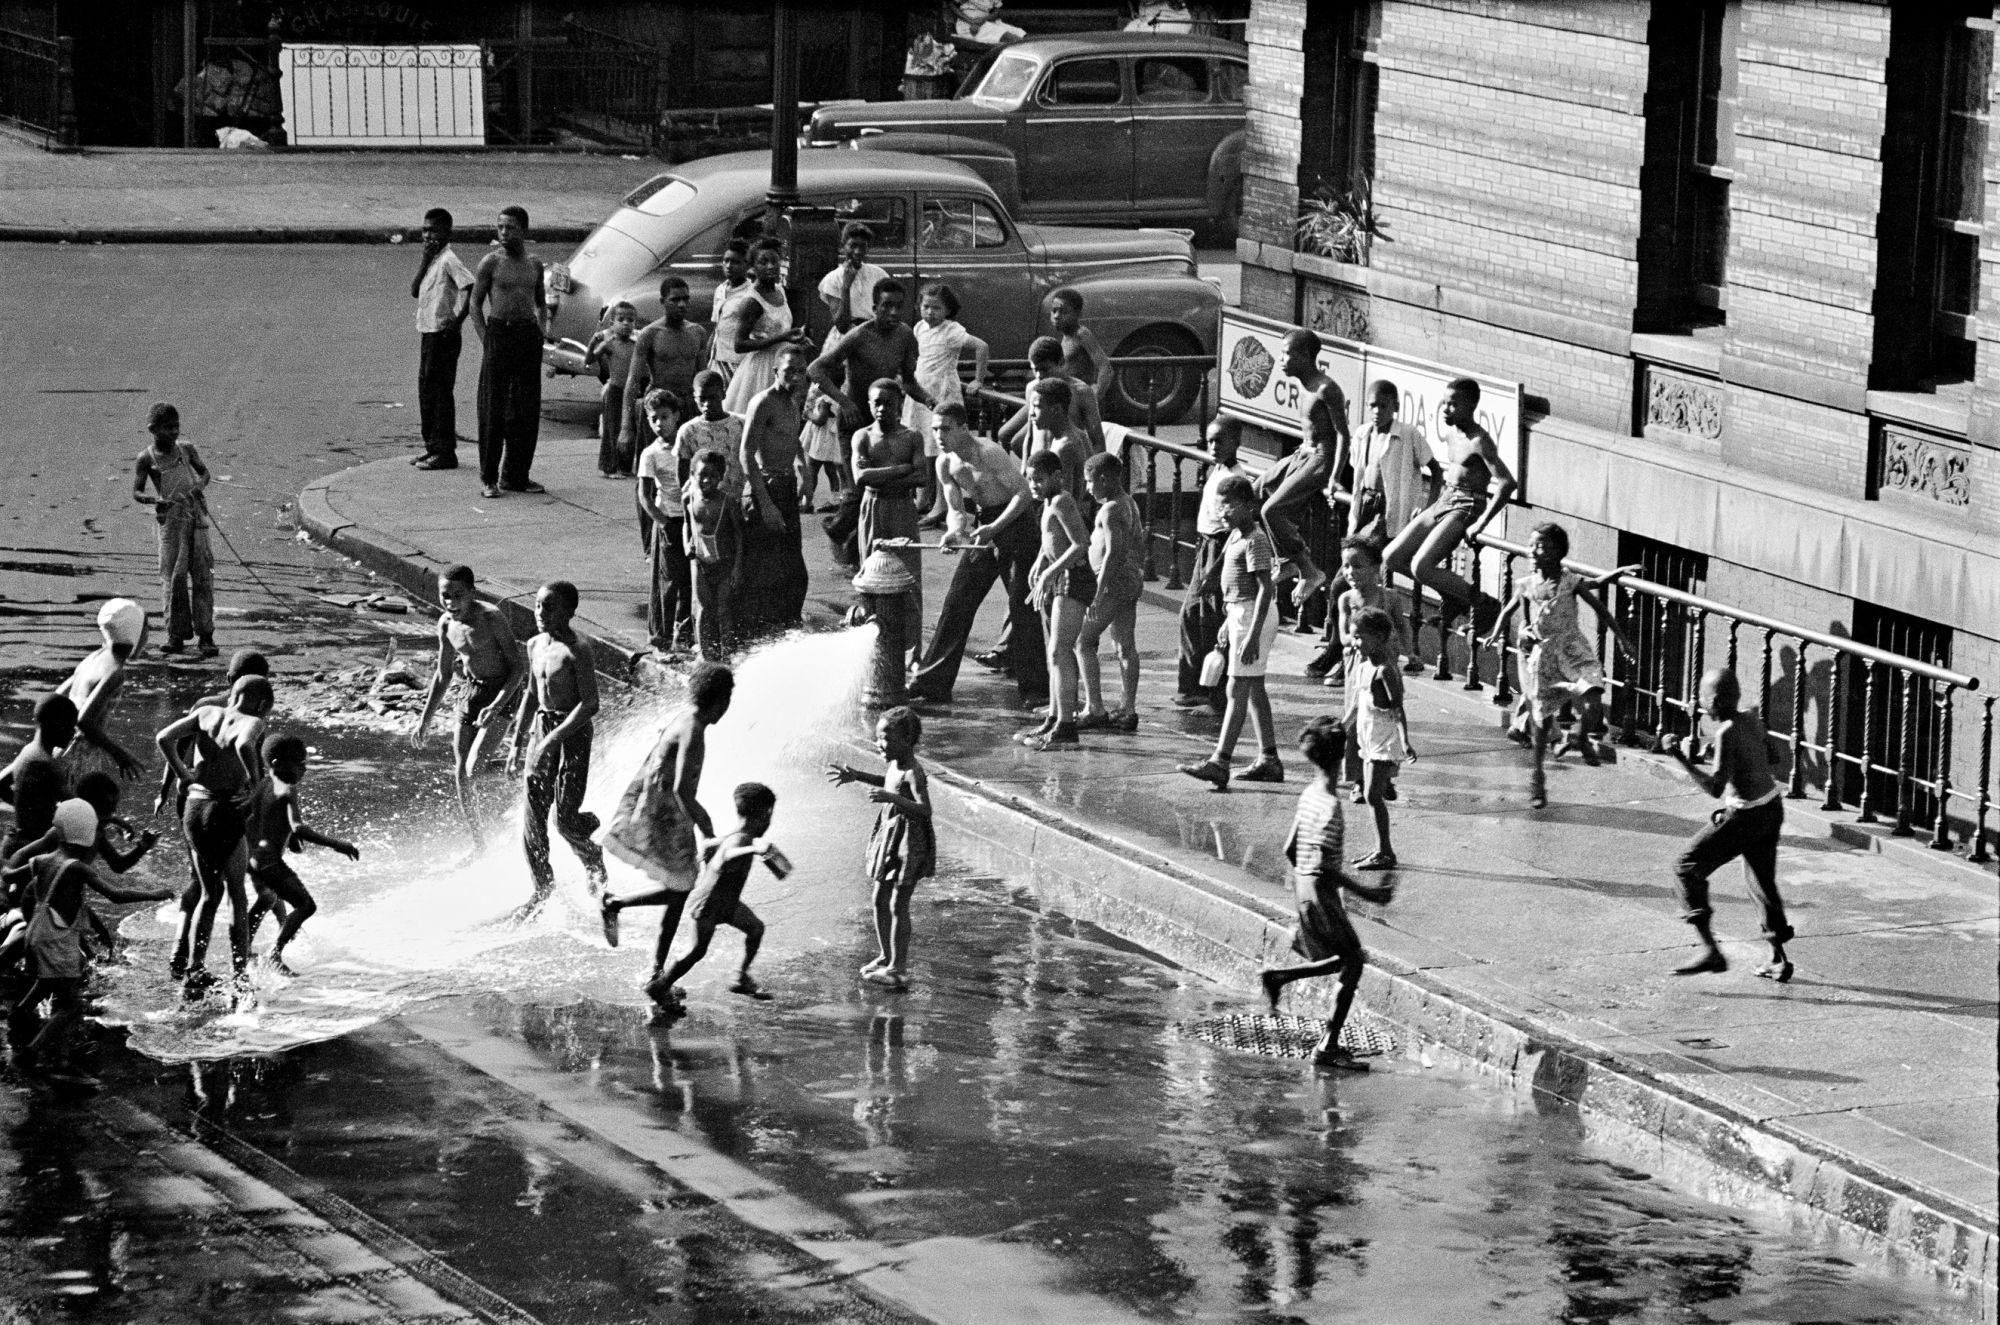 0010 Revisiting Gordon Parks' Classic Photo Essay, 'Harlem Gang